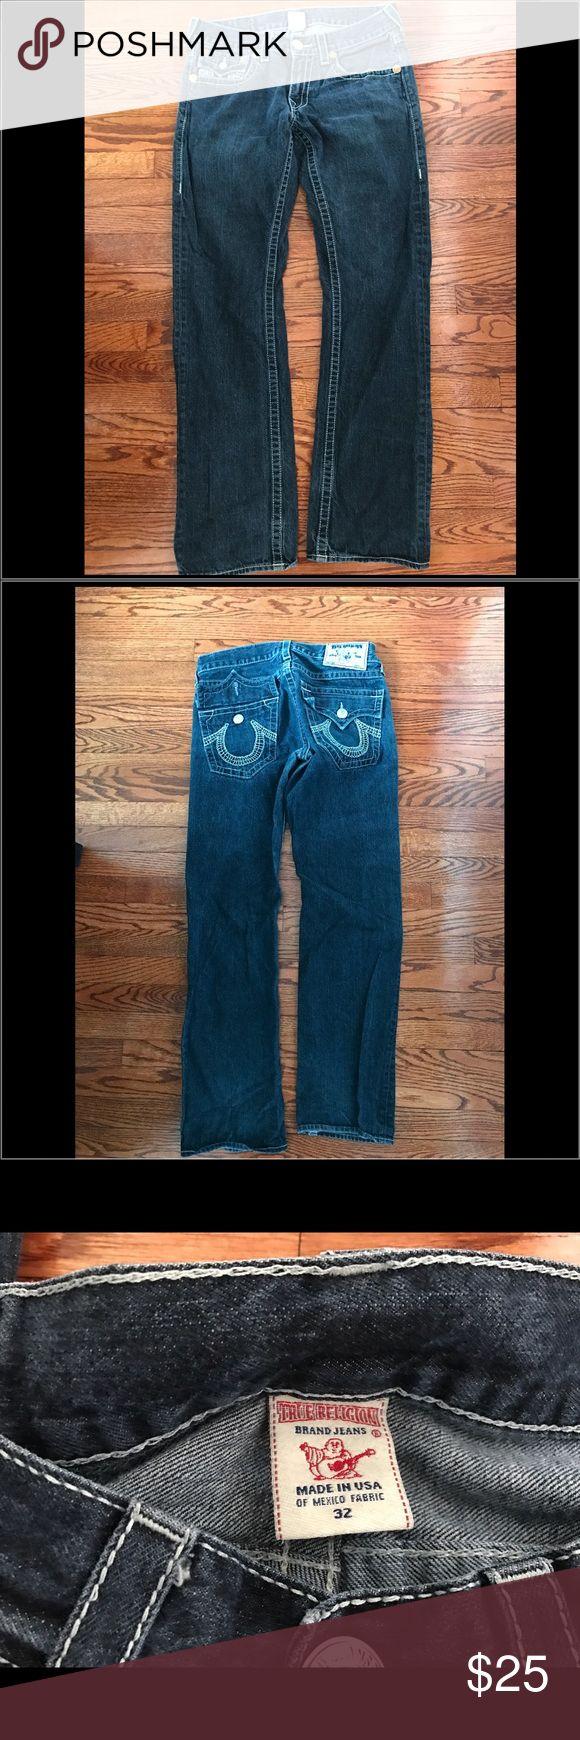 True Religion Men's Jeans Gently used men's True Religion Jeans. Size 32 True Religion Jeans Relaxed